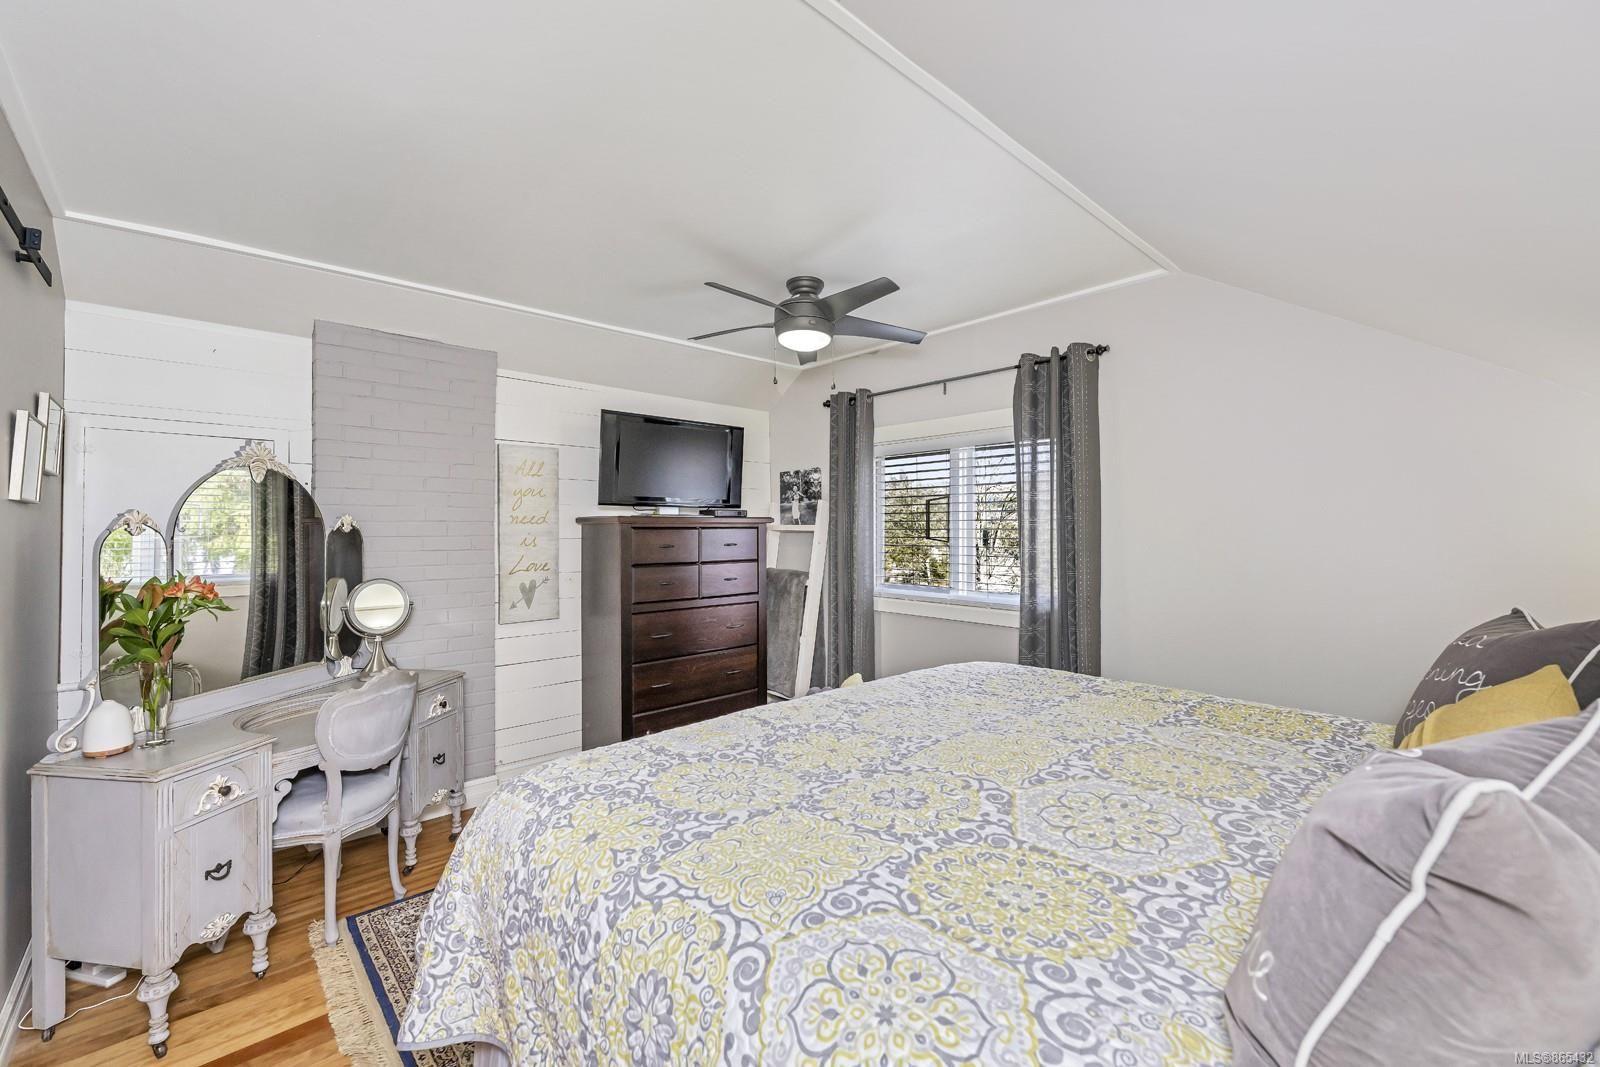 Photo 25: Photos: 6734 Drummond Dr in : Du East Duncan House for sale (Duncan)  : MLS®# 865432